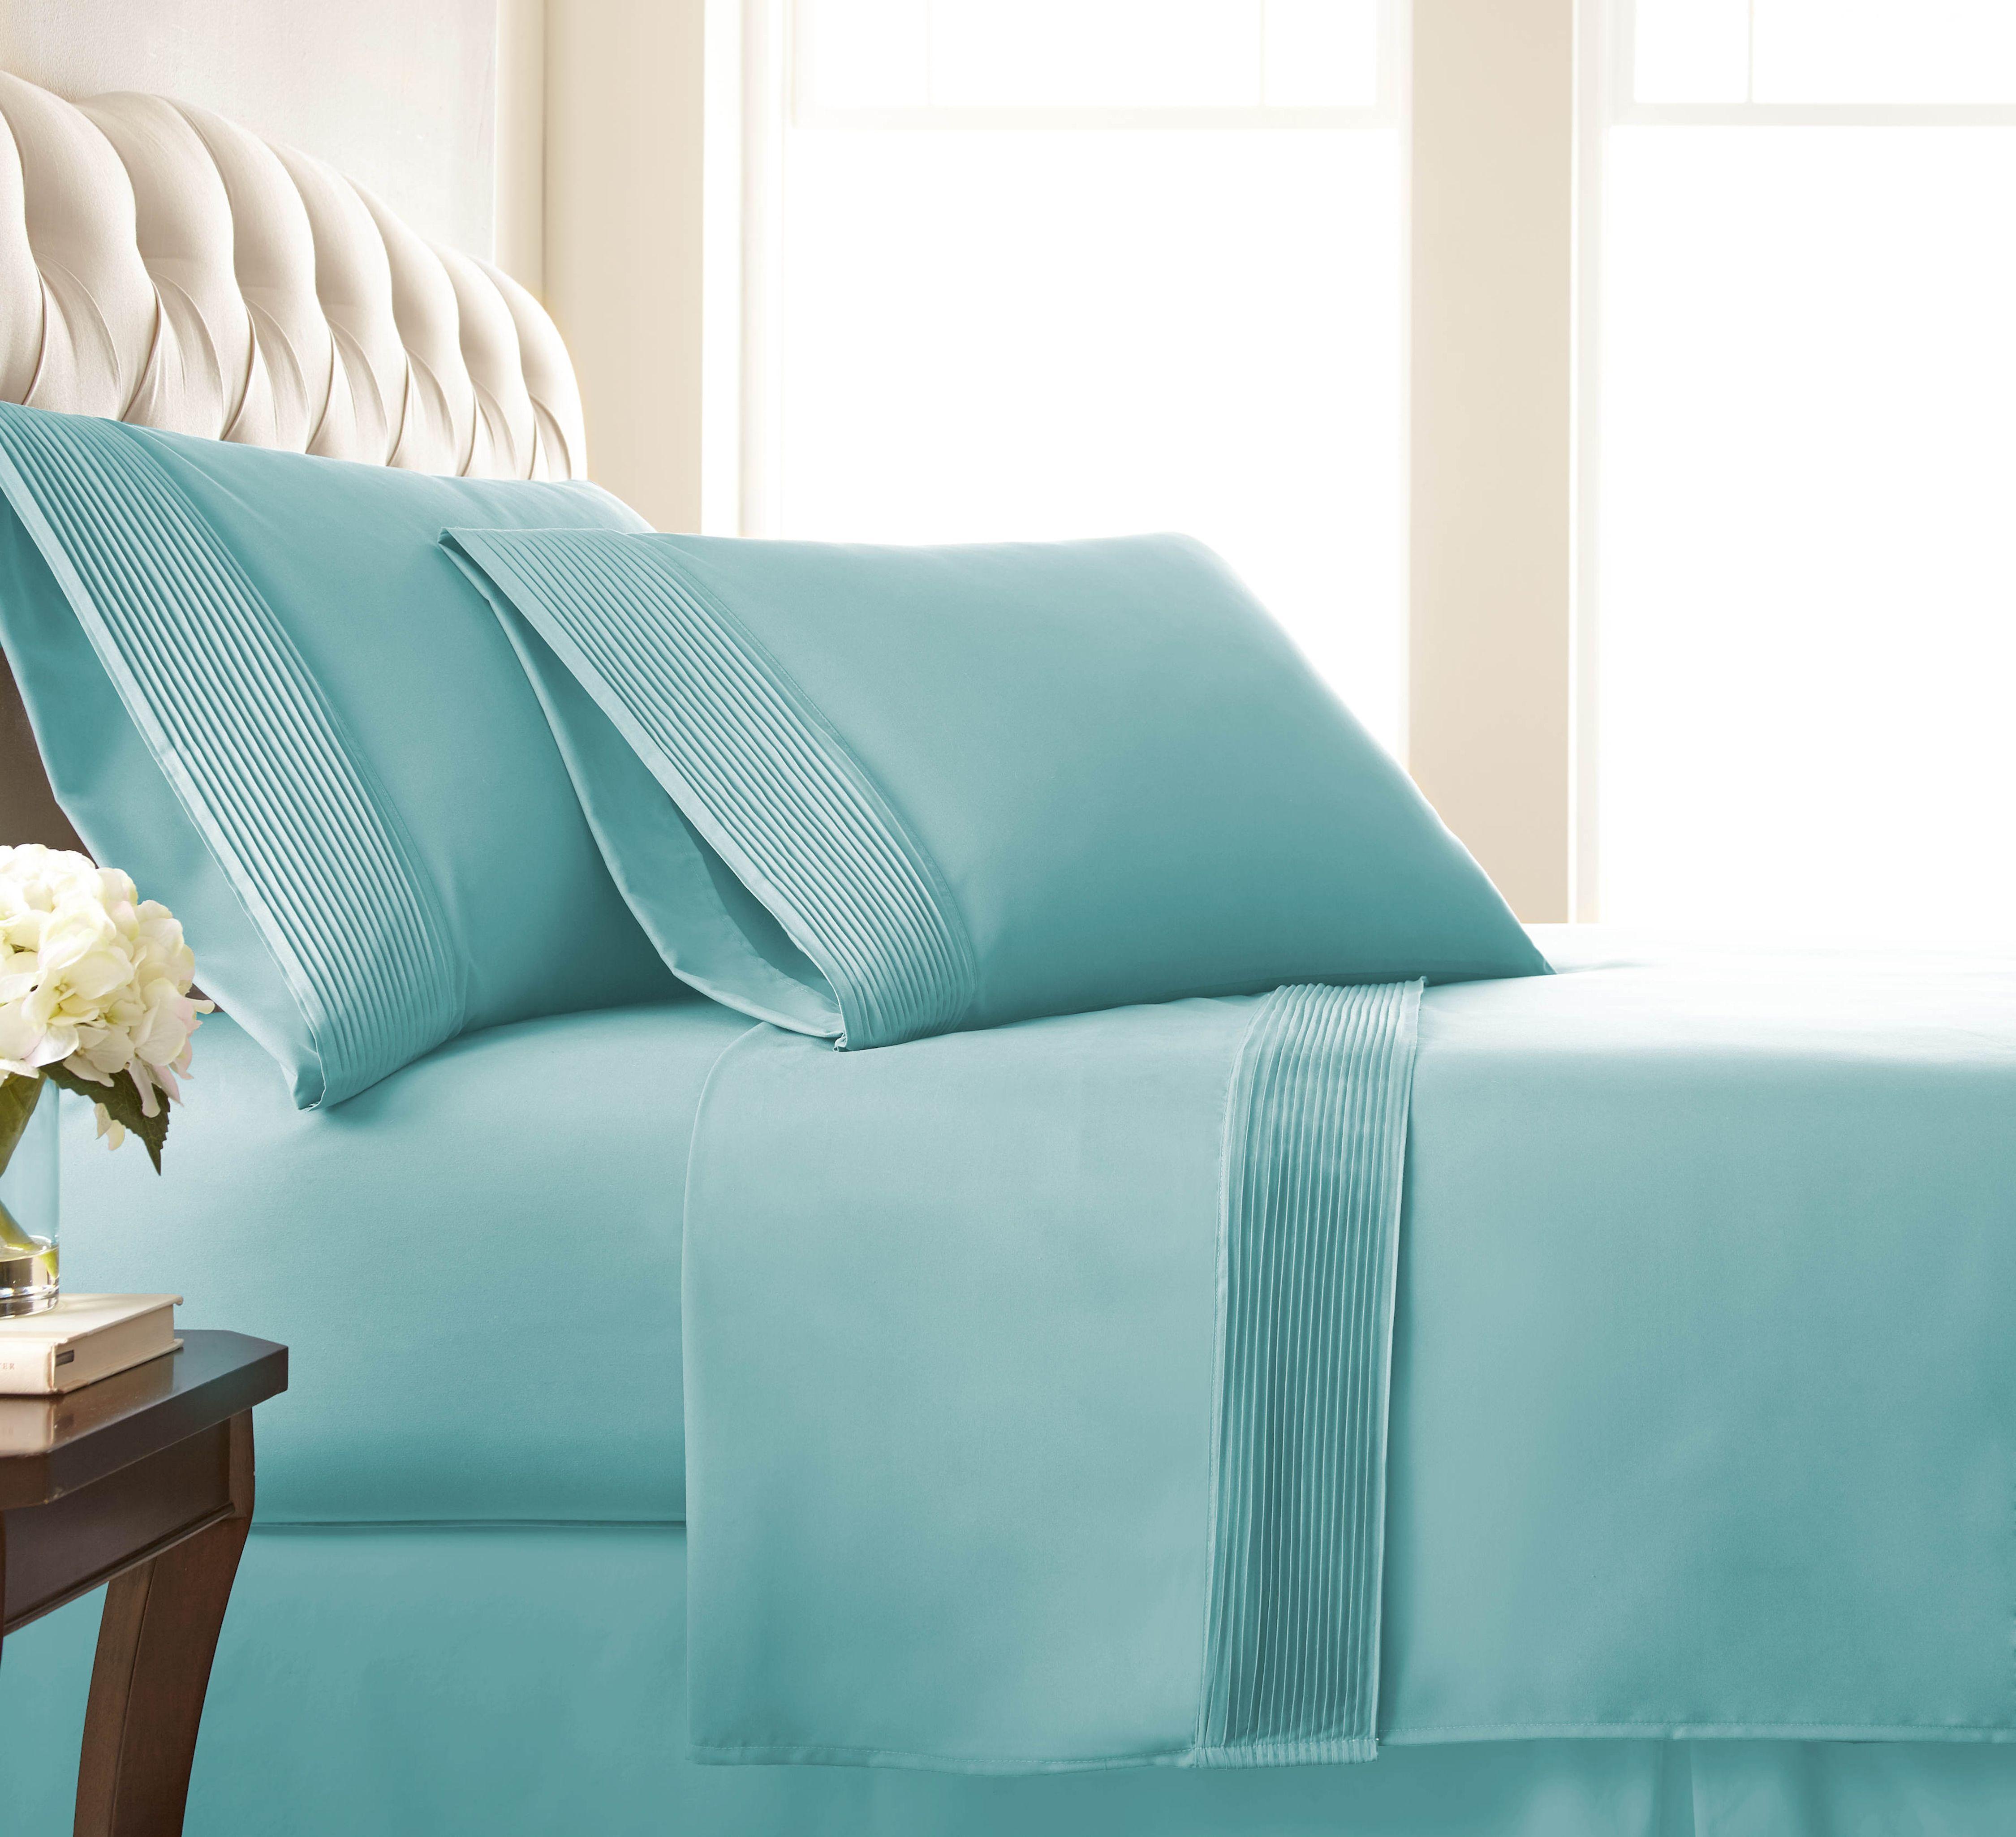 Blue extra deep pocket pleated sheet sets with pleated hem